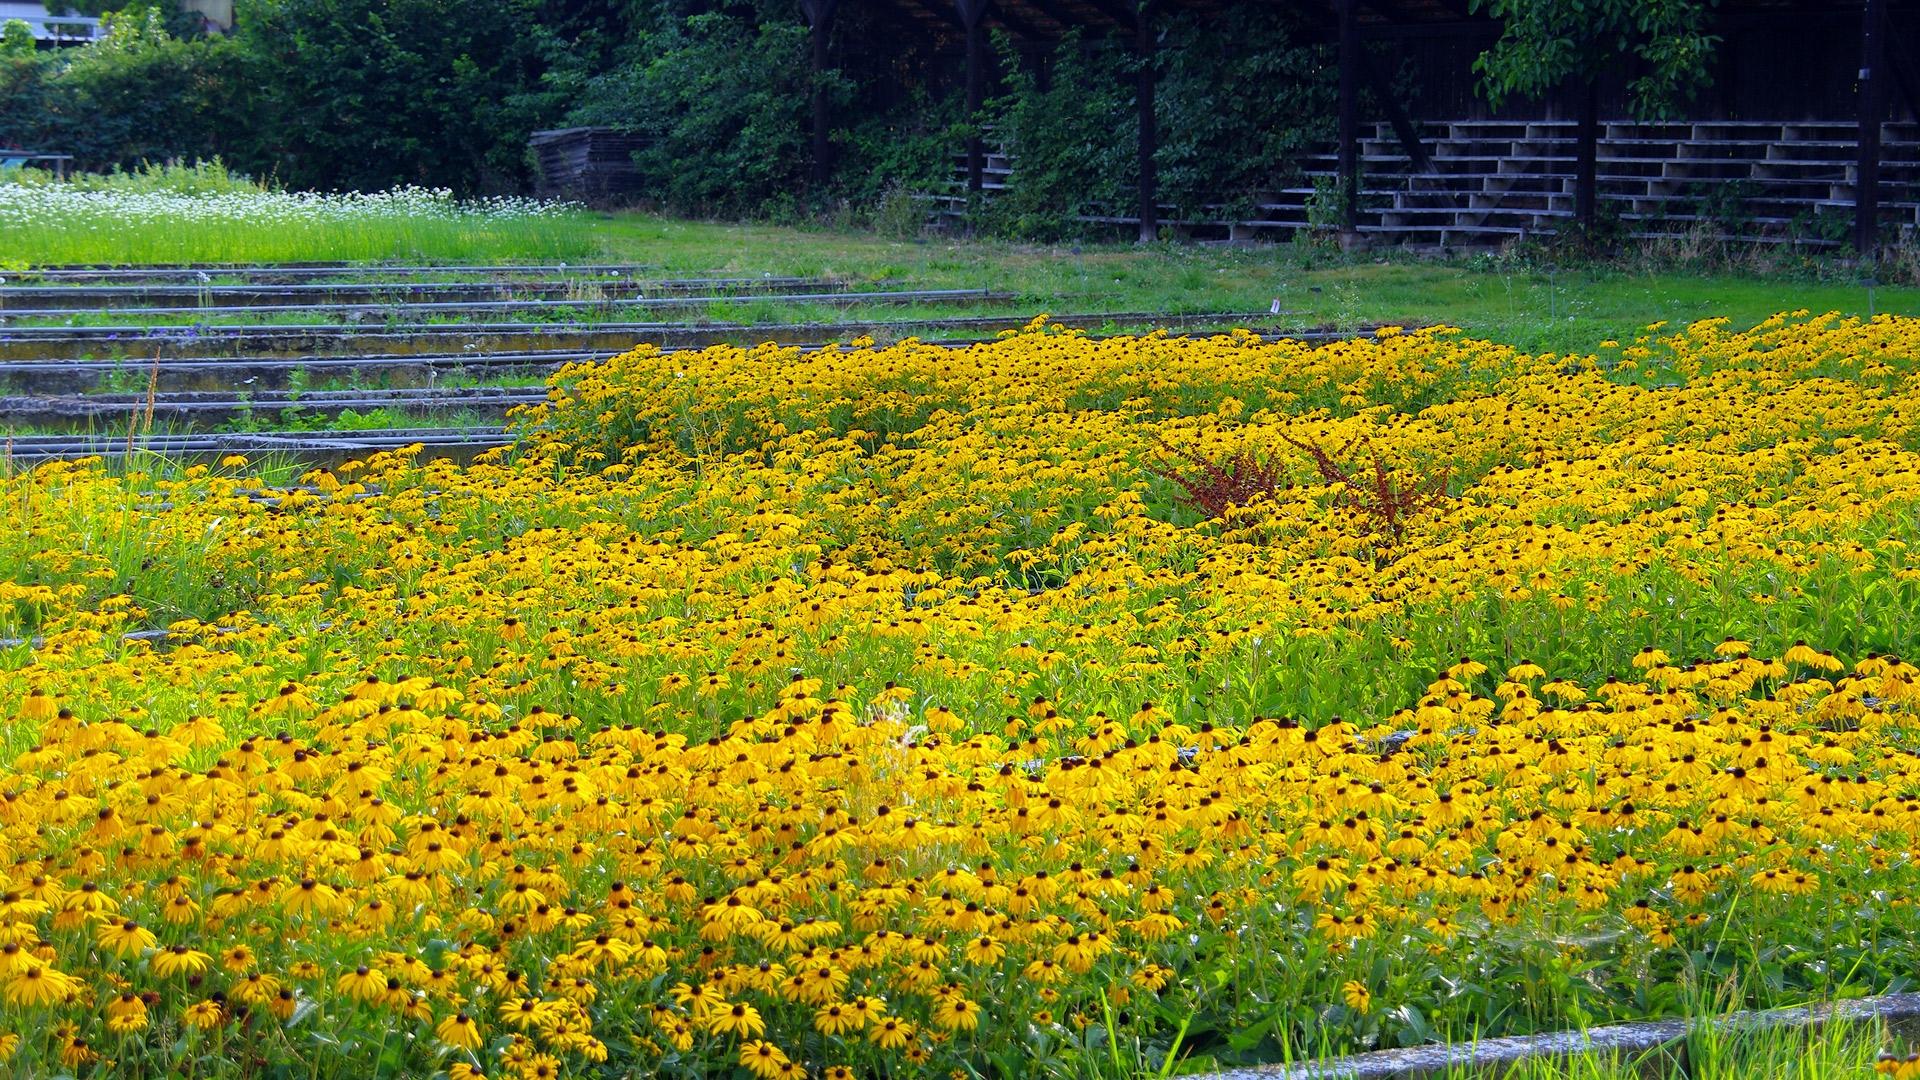 Gelber Sonnenhut (Rudbeckia fulgida)